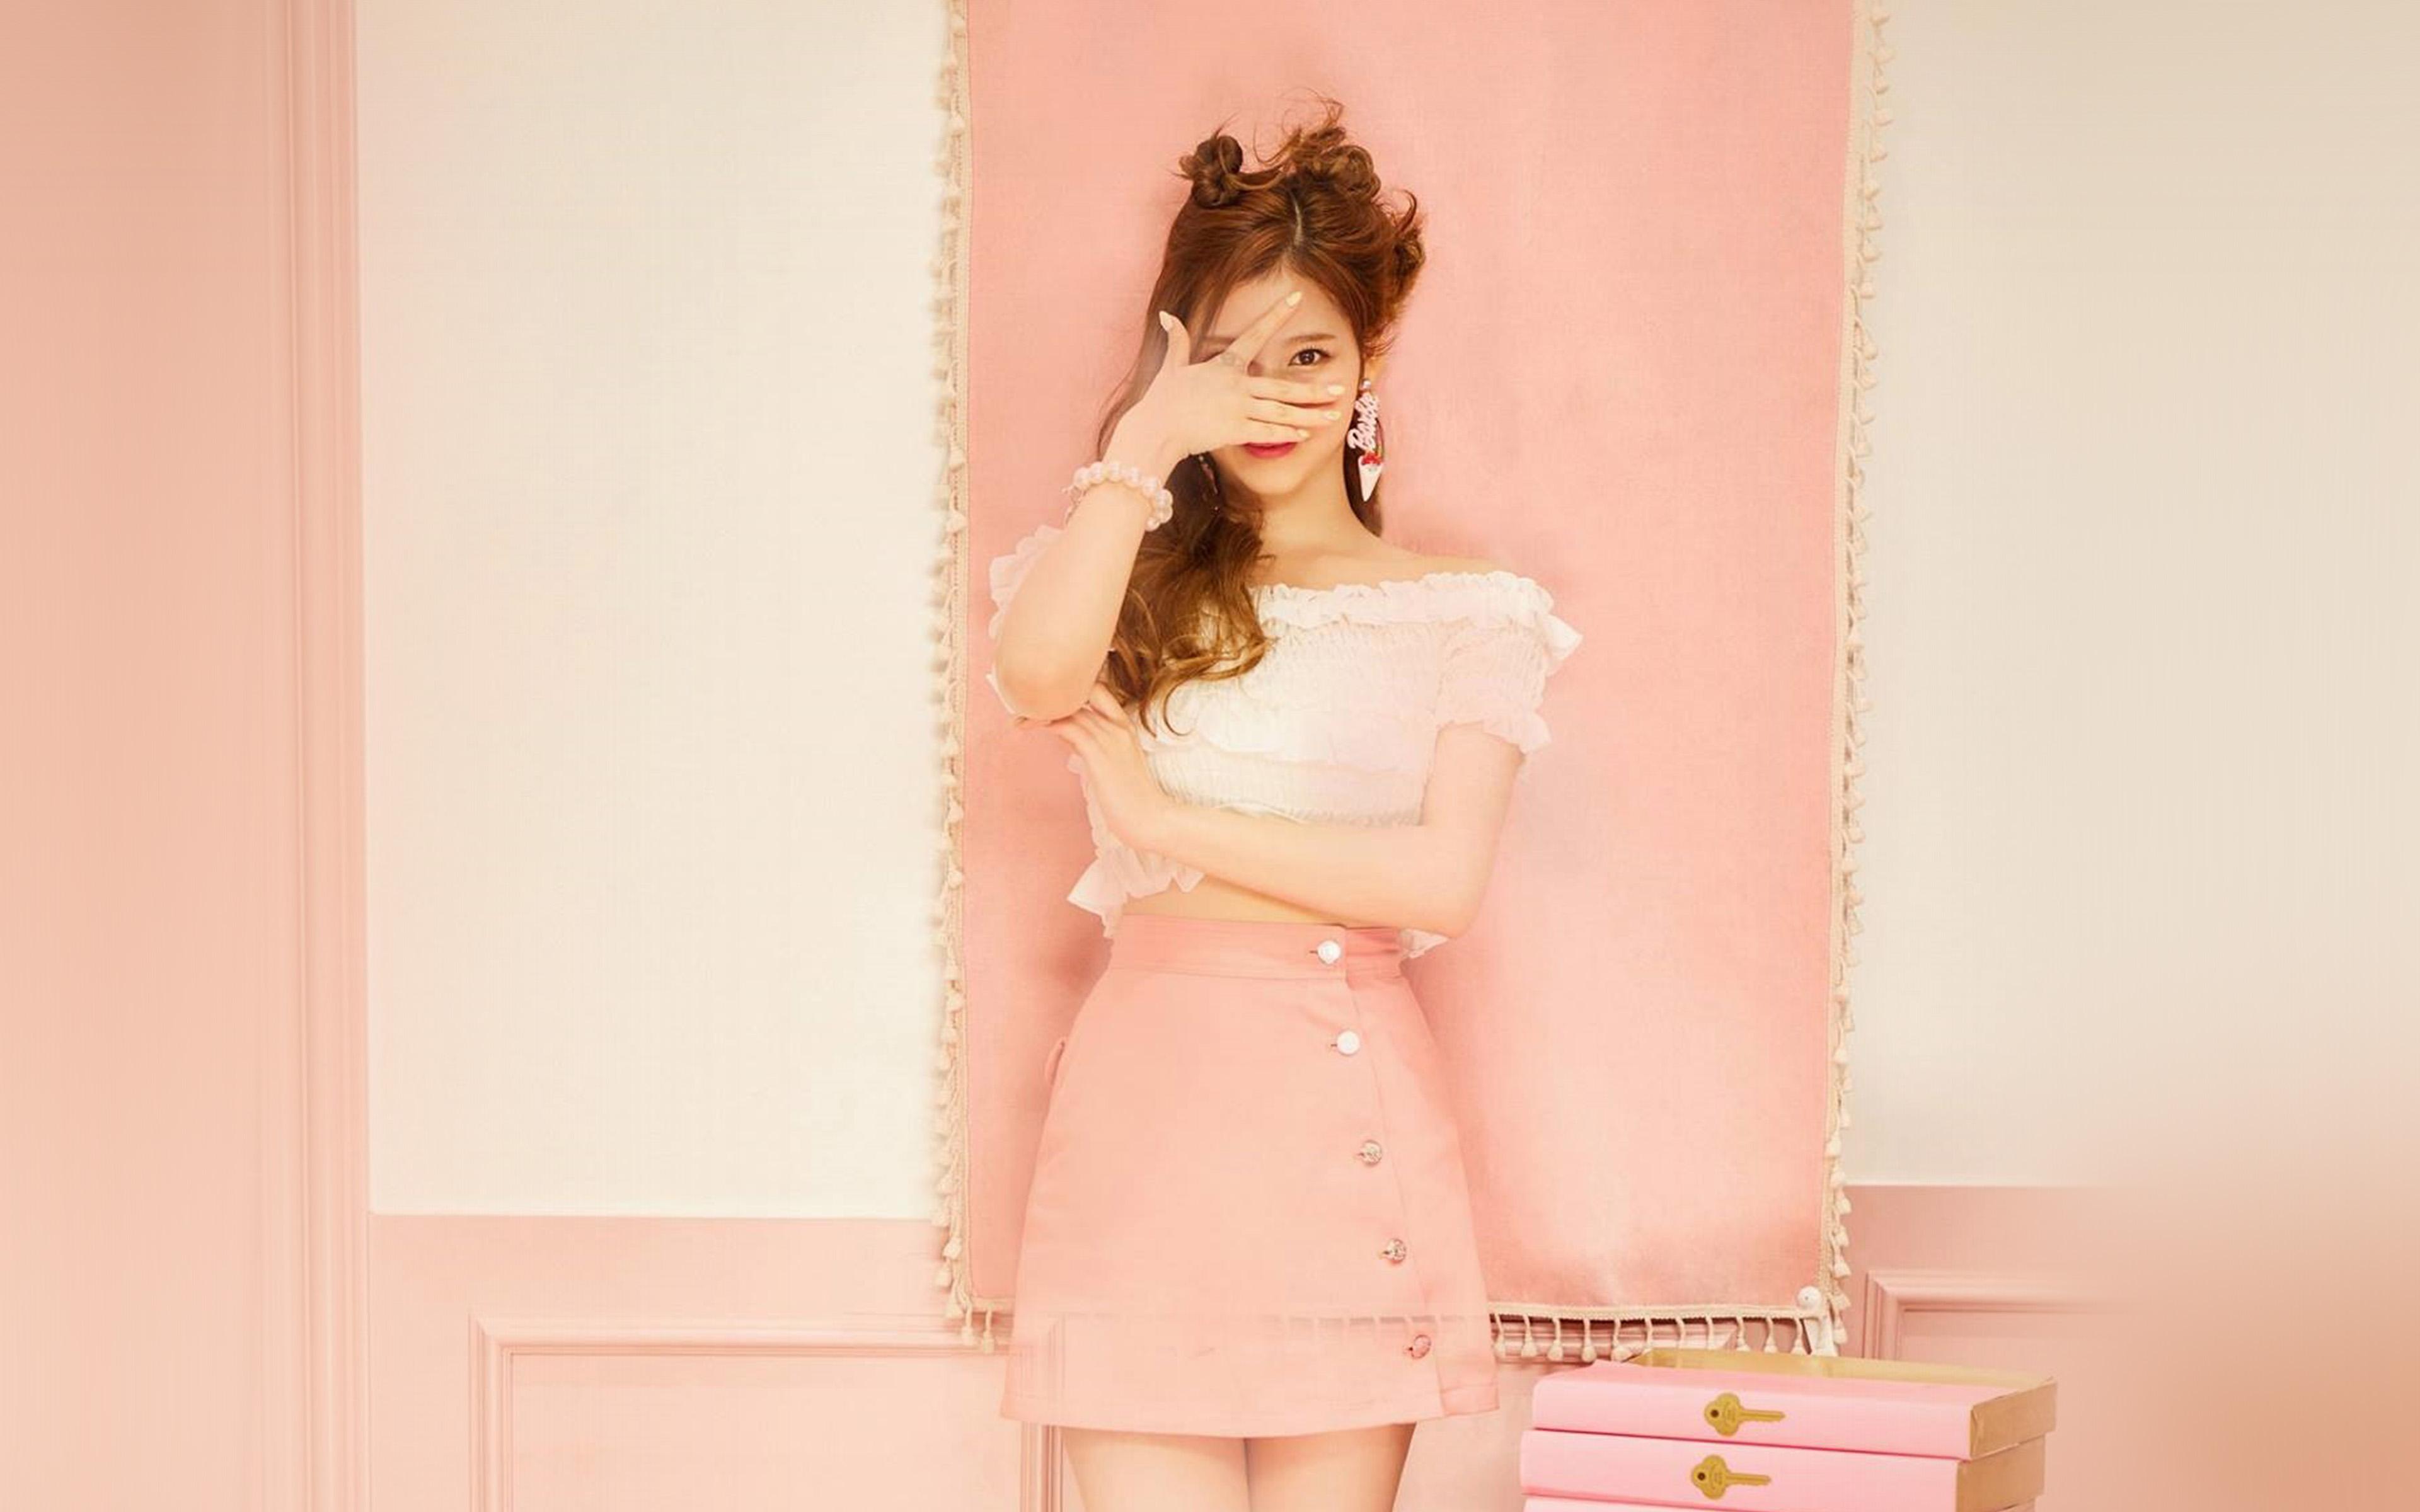 Hn12 Sana Girl Twice Kpop Cute Pink Wallpaper